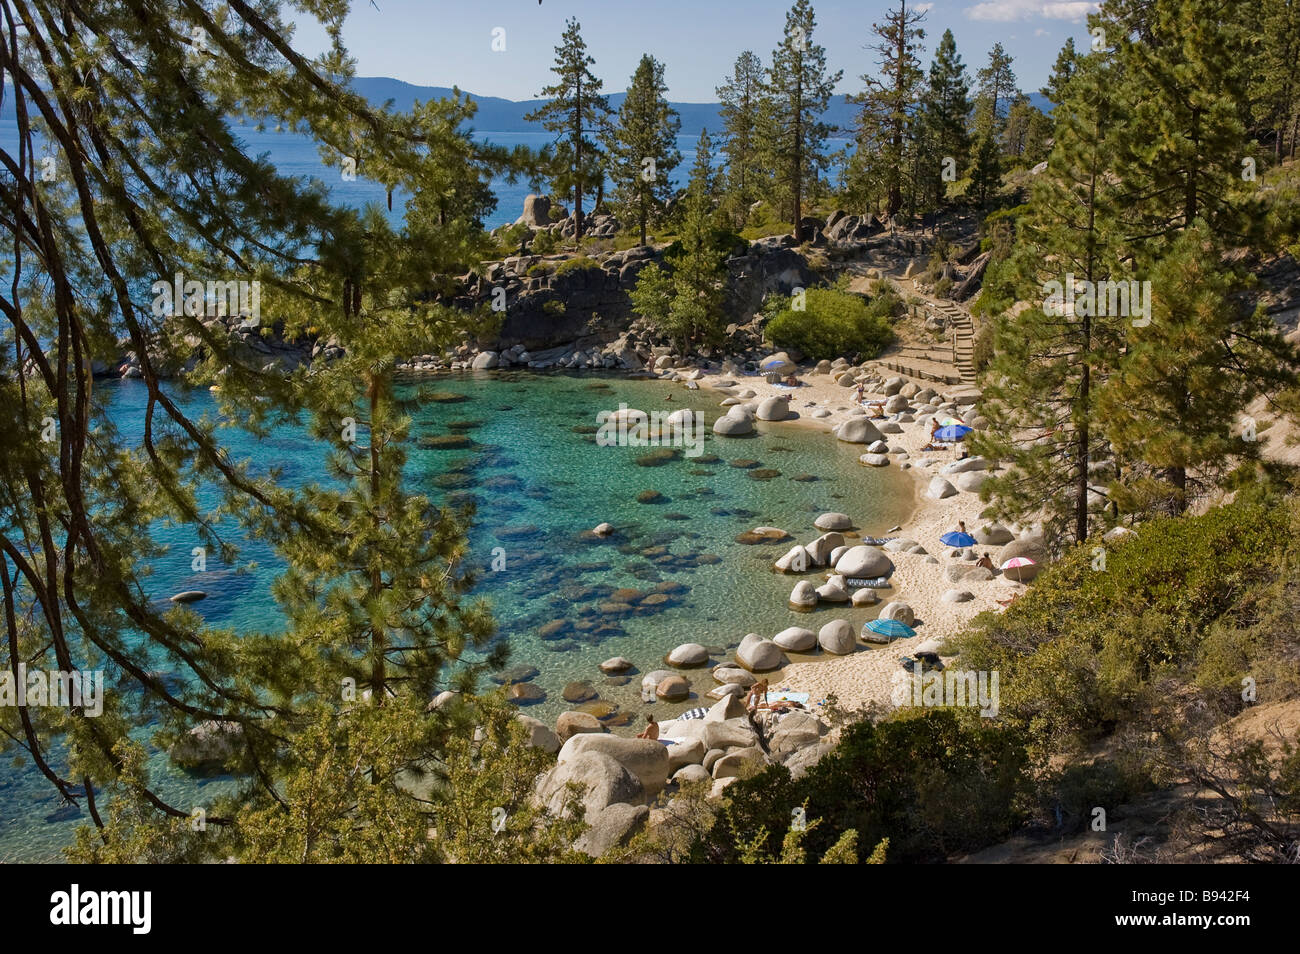 Tahoe nudebeach Nude Photos 23